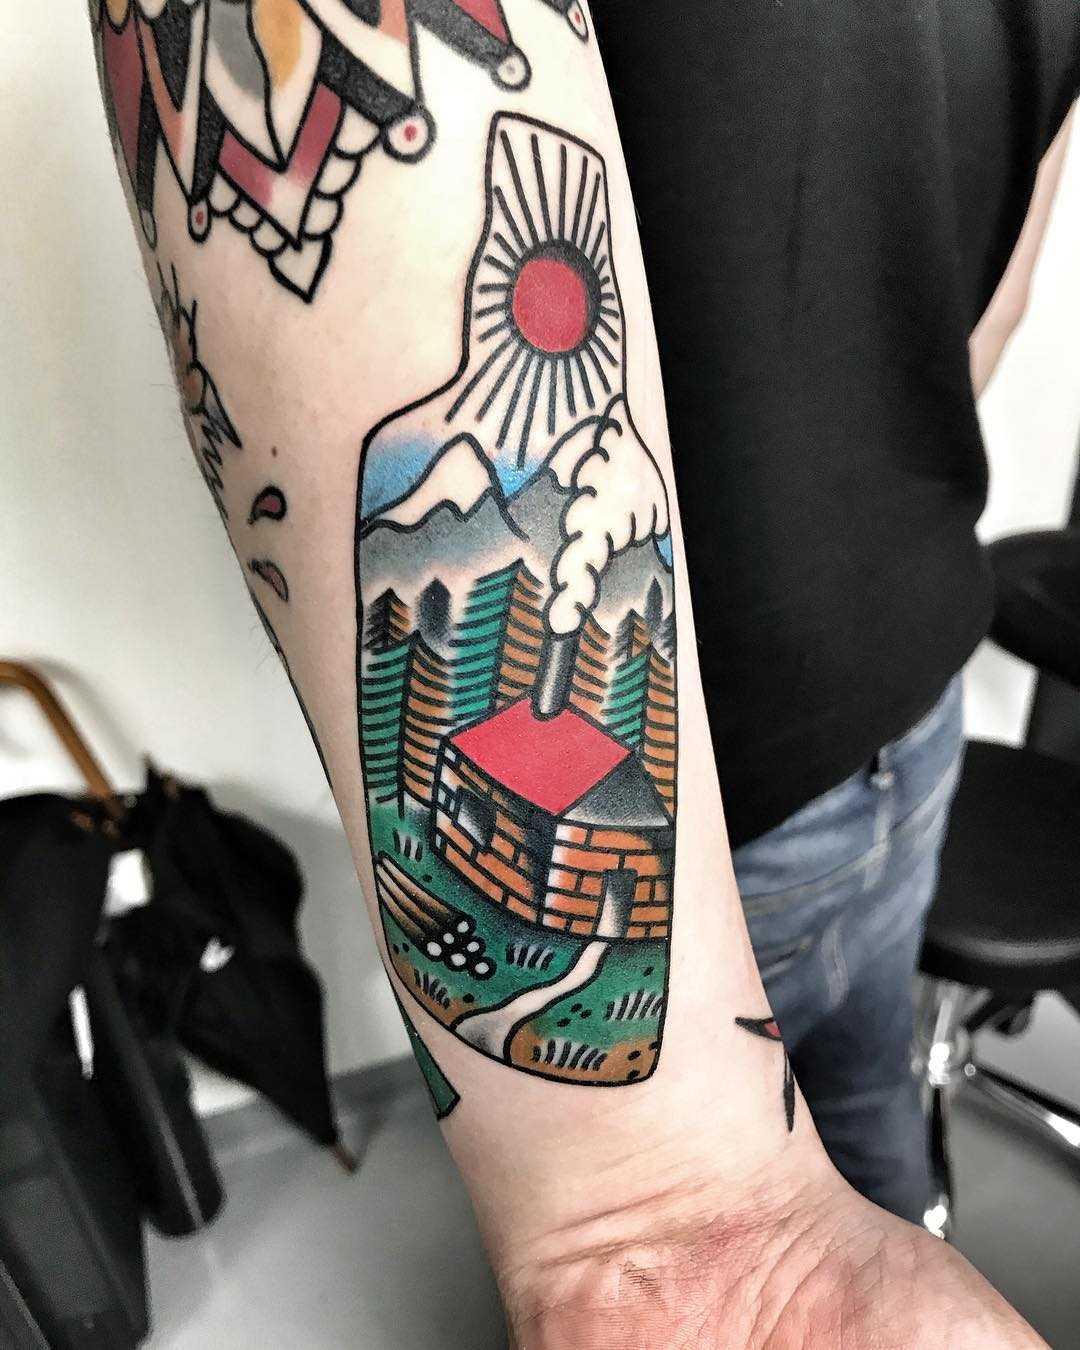 Landscape bottle tattoo by Mike Nofuck